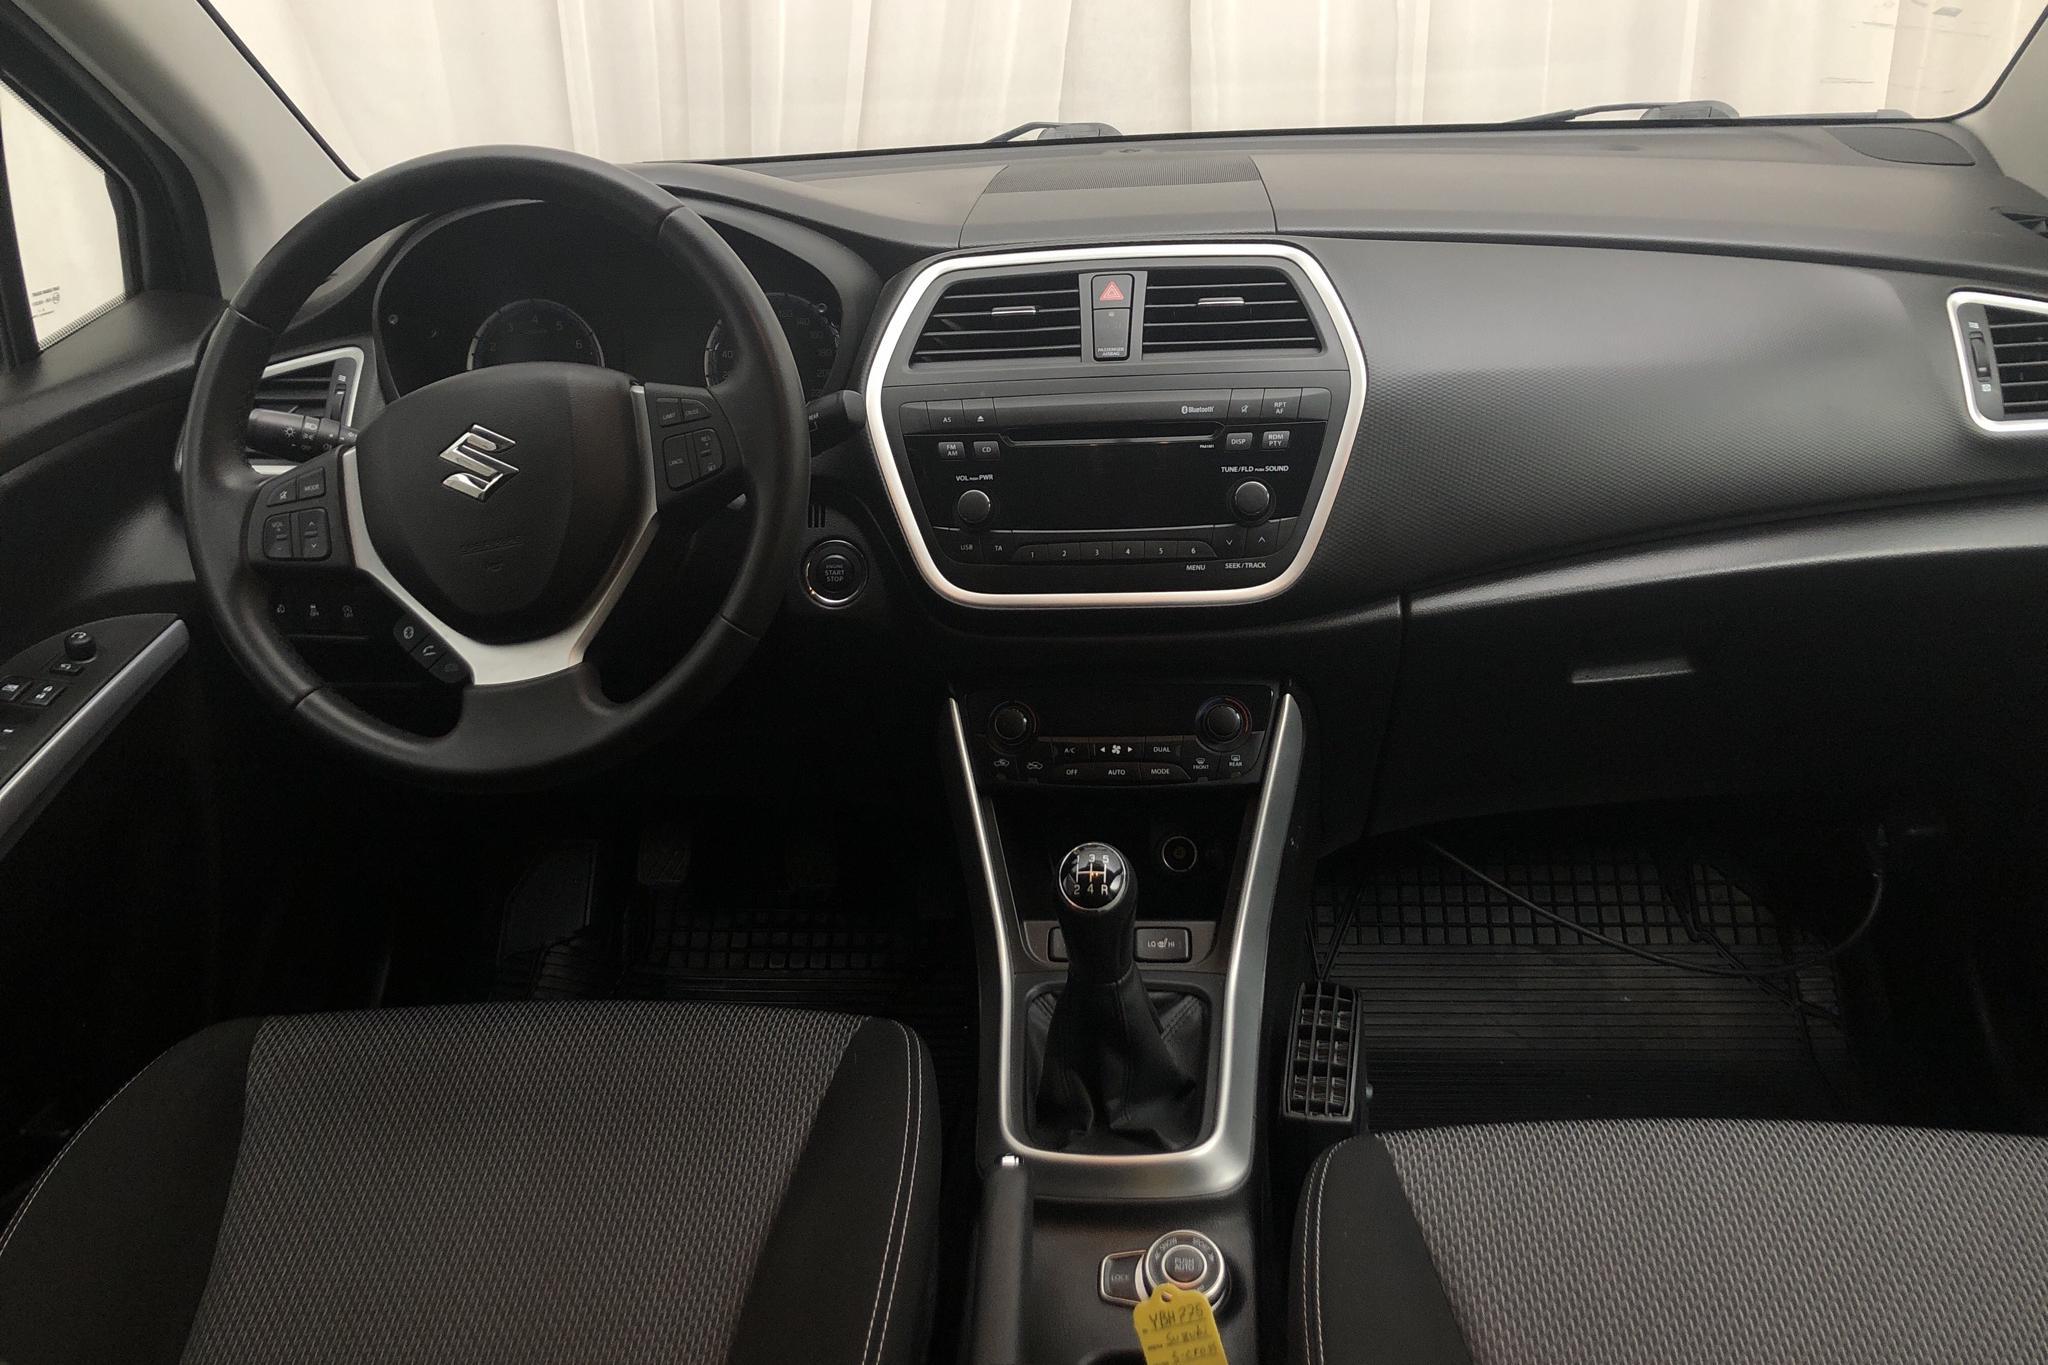 Suzuki S-Cross 1.6 4x4 (120hk) - 24 920 km - Manual - white - 2016